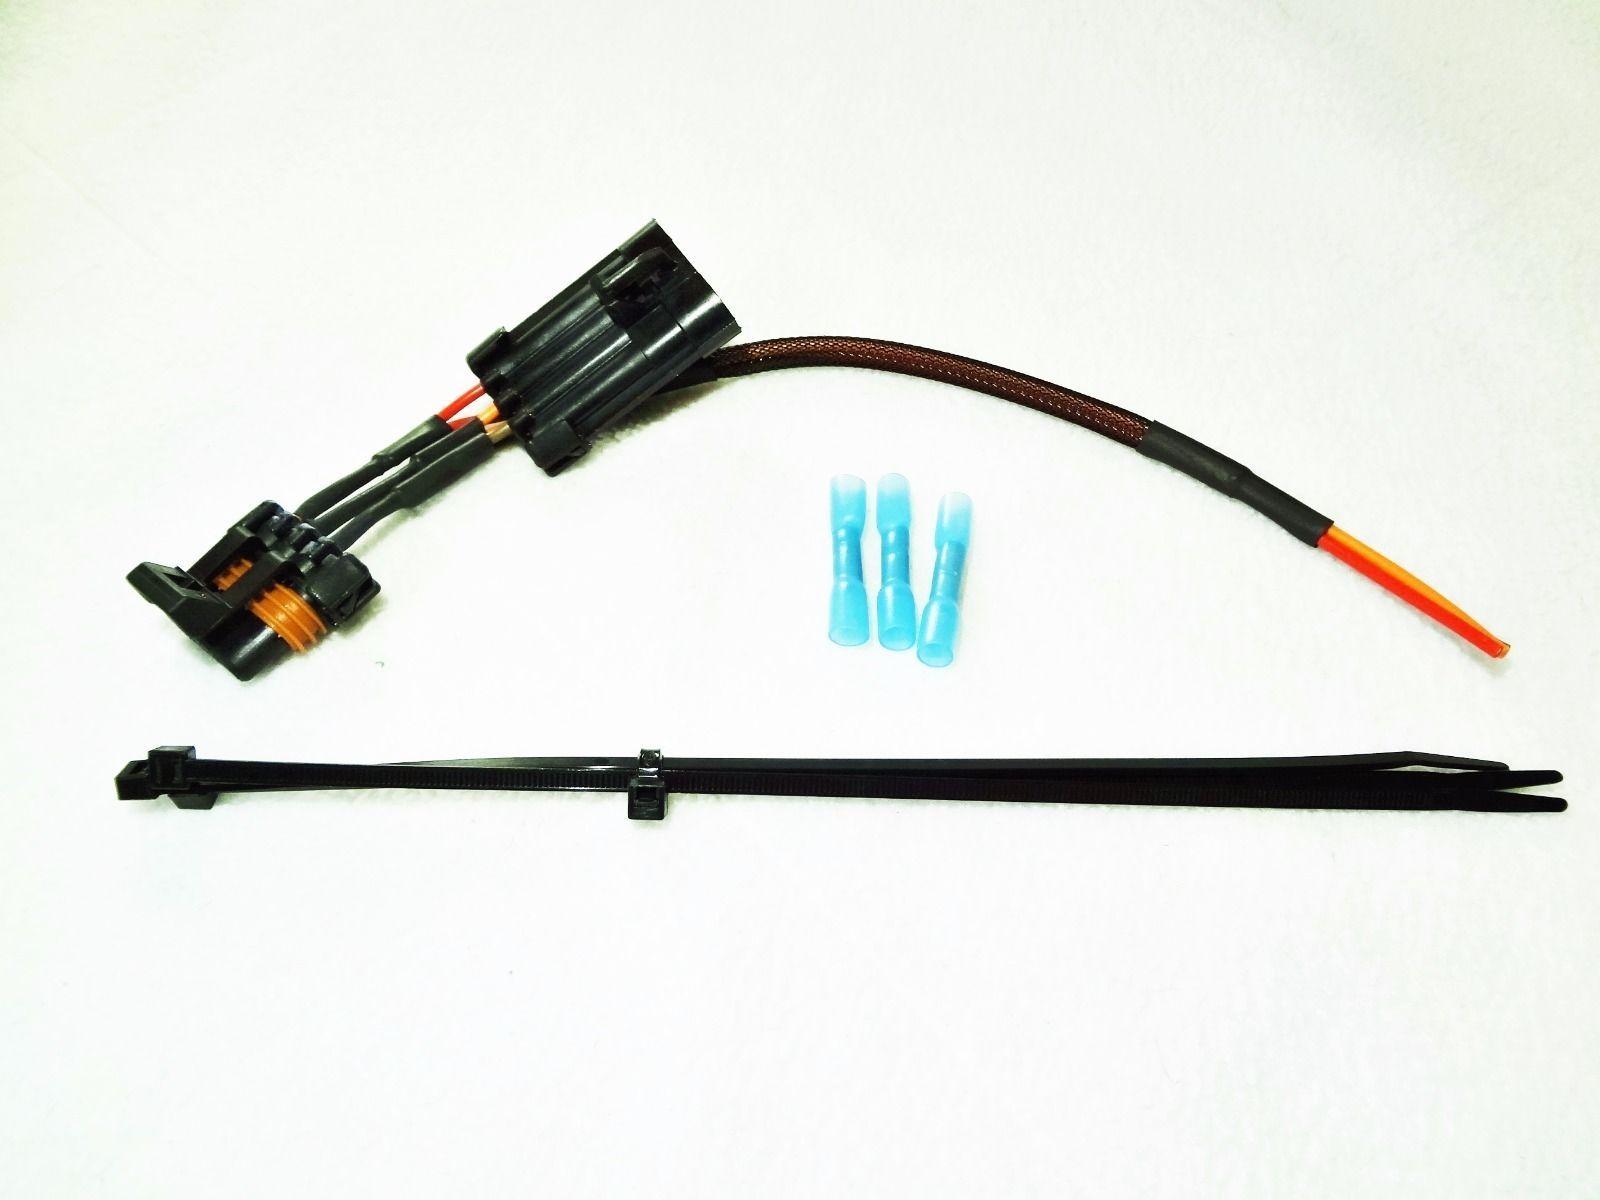 Polaris RZR UTV Lighted Whip License Plate Accessory Wiring Harness